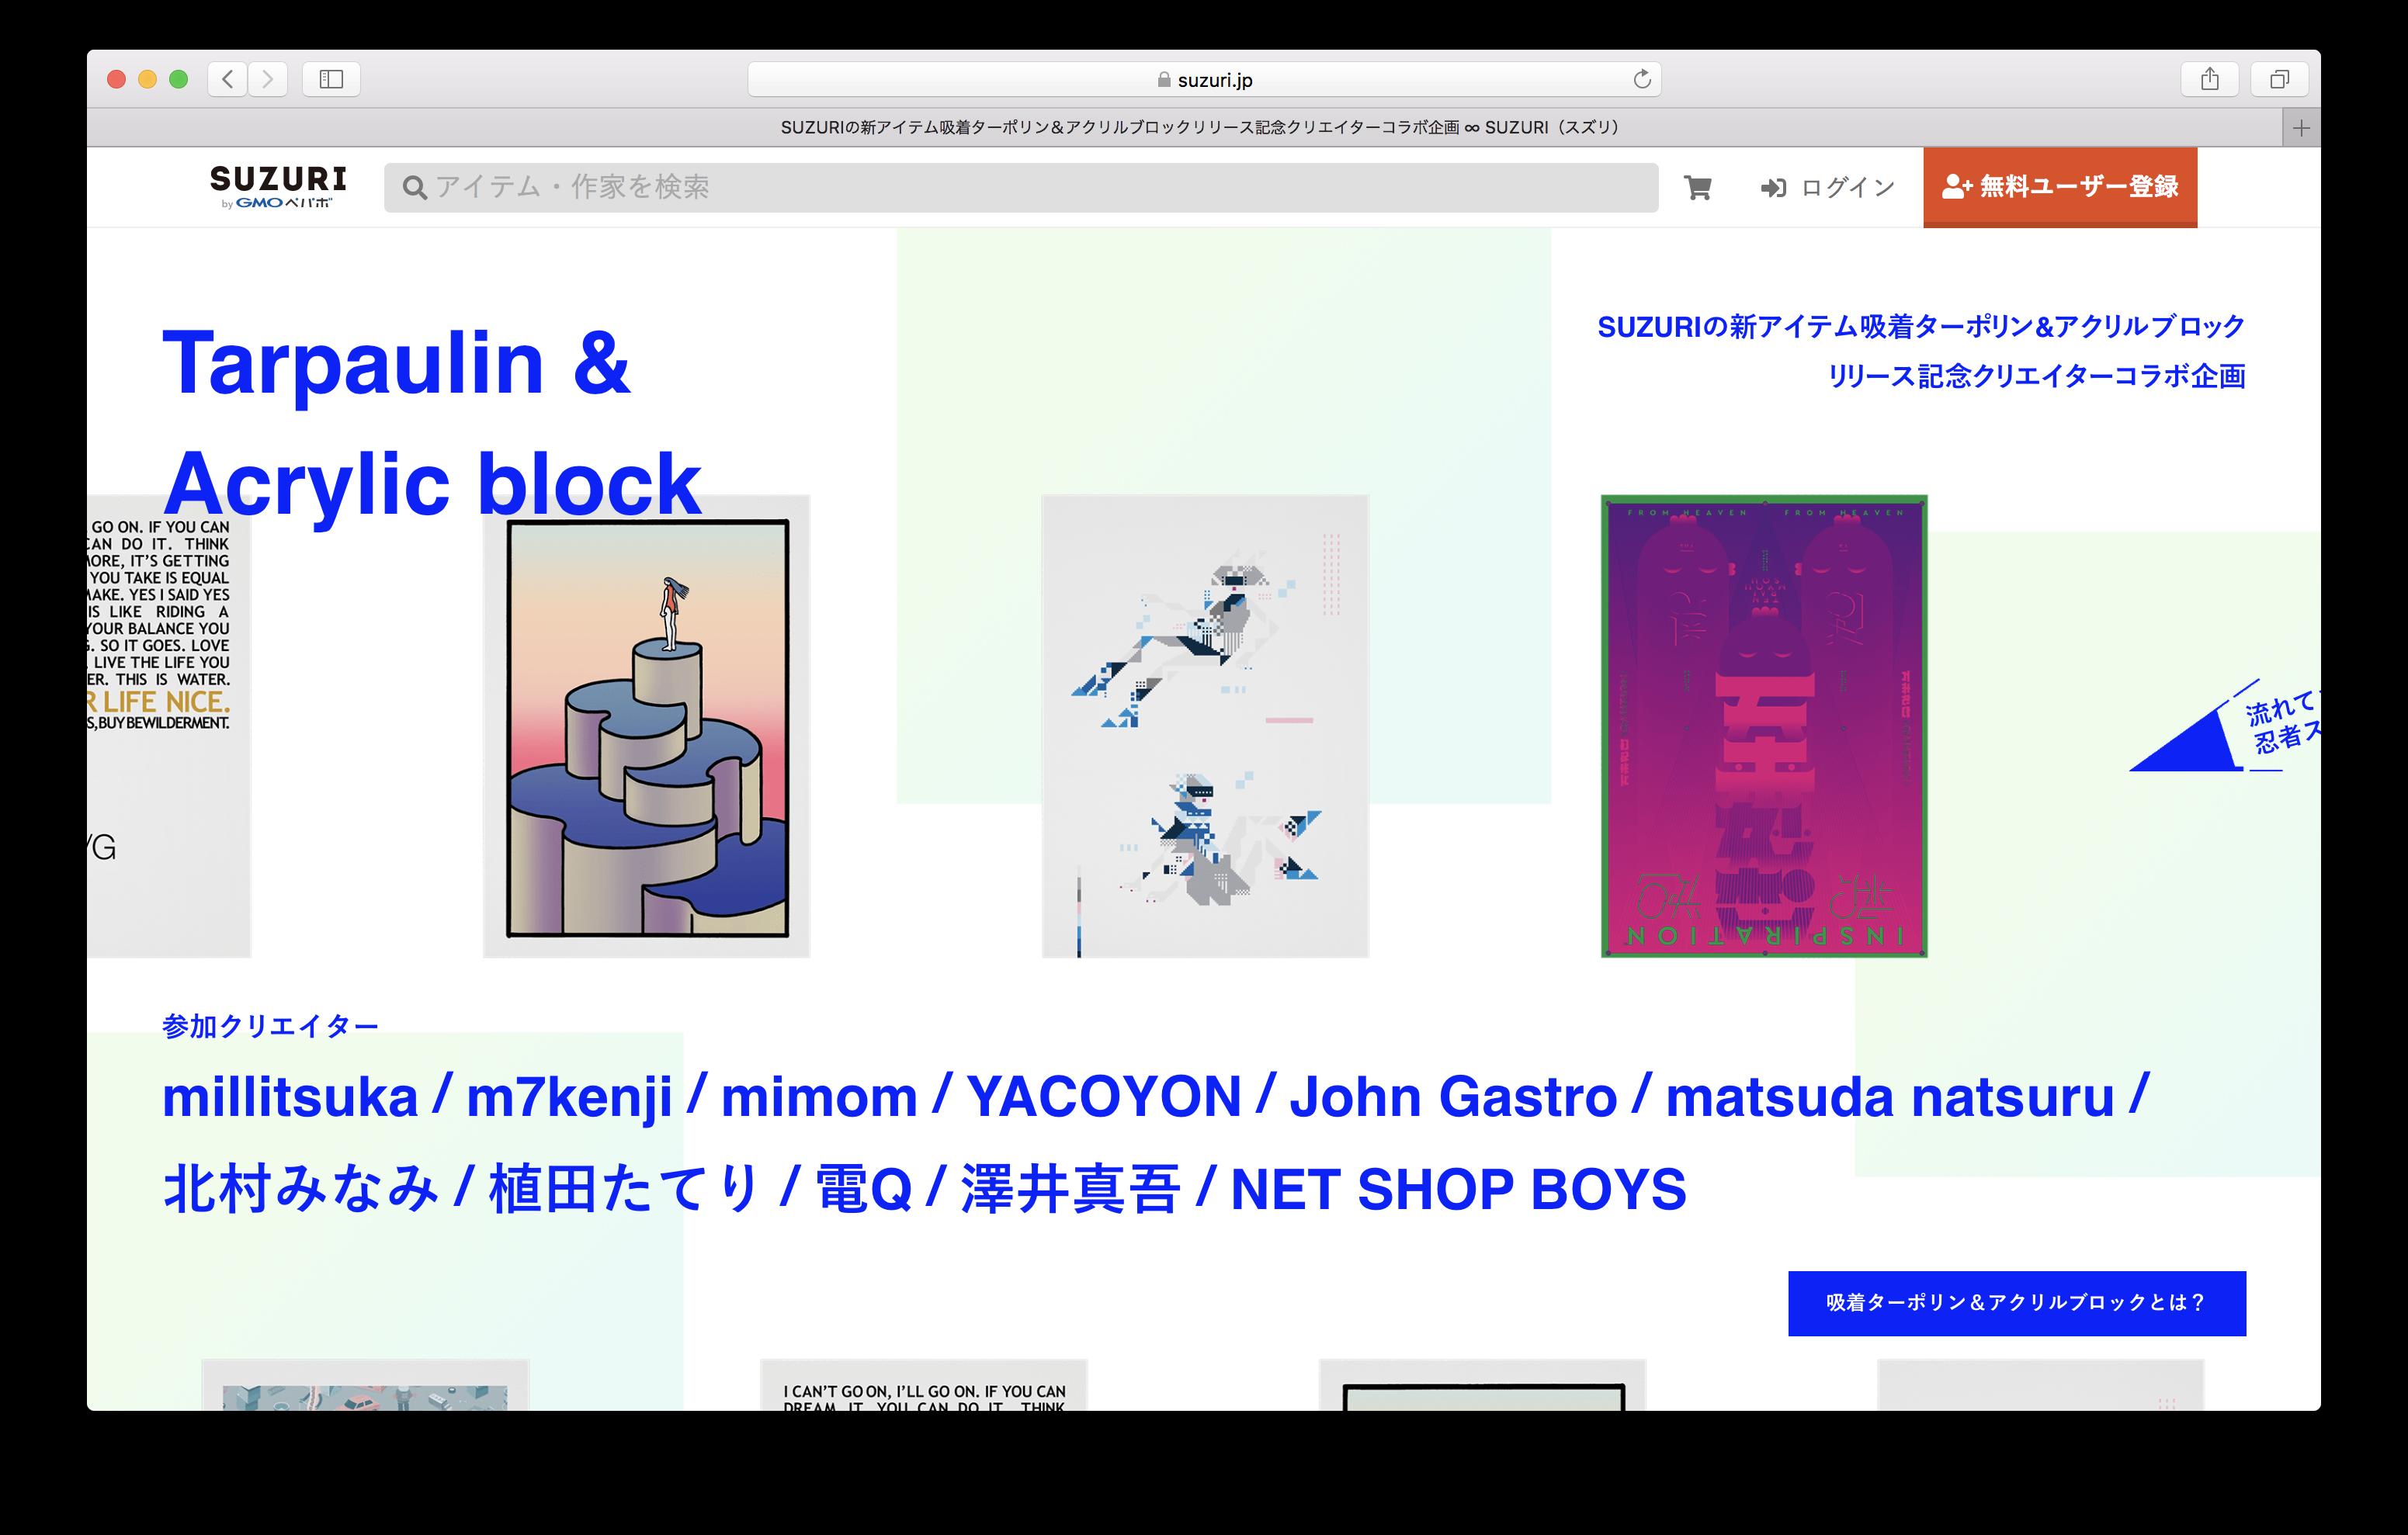 SUZURIの新アイテム吸着ターポリン&アクリルブロックリリース記念クリエイターコラボ企画 ∞ SUZURI(スズリ)